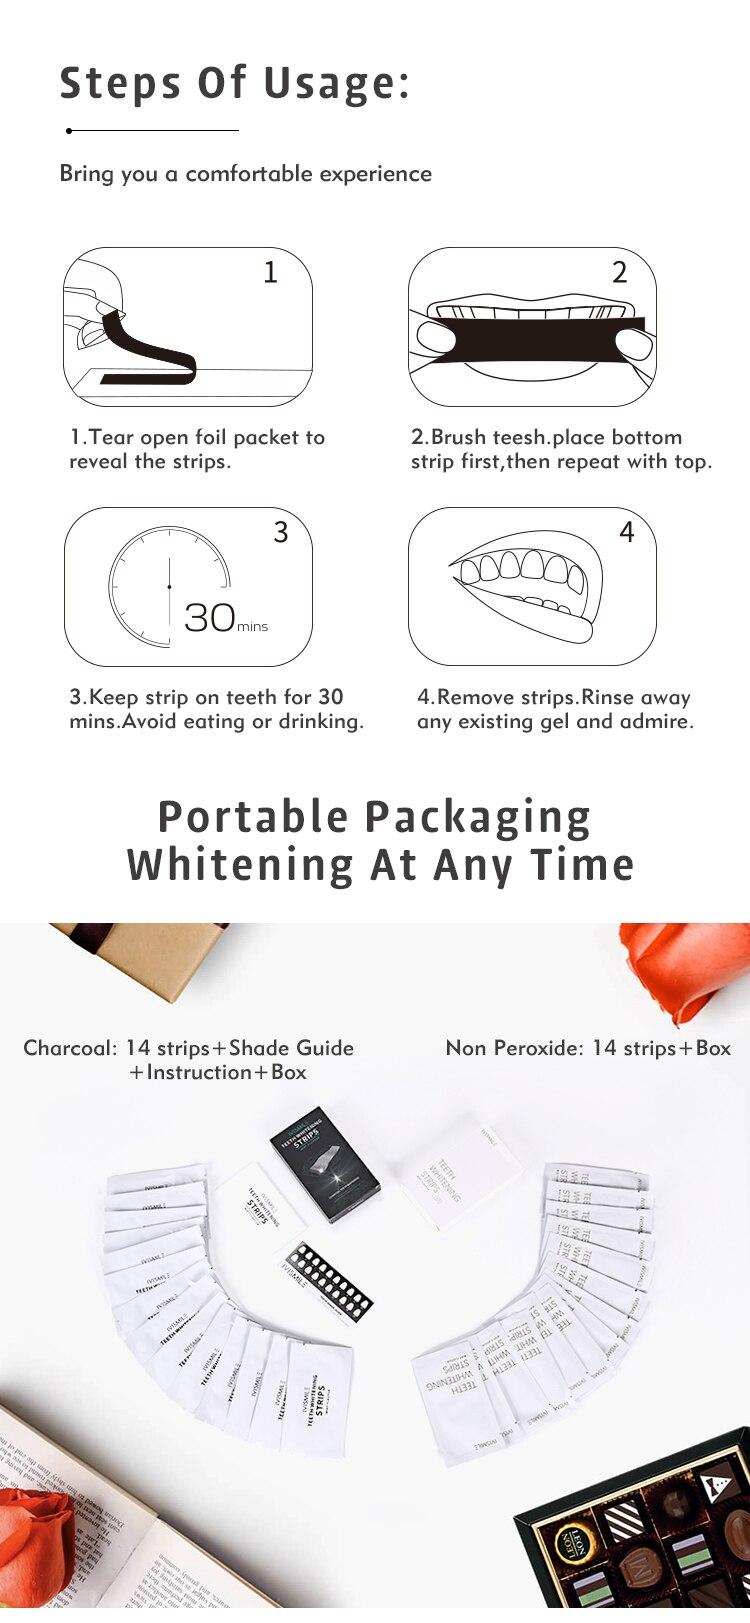 higiene oral limpo dental branqueamento tira